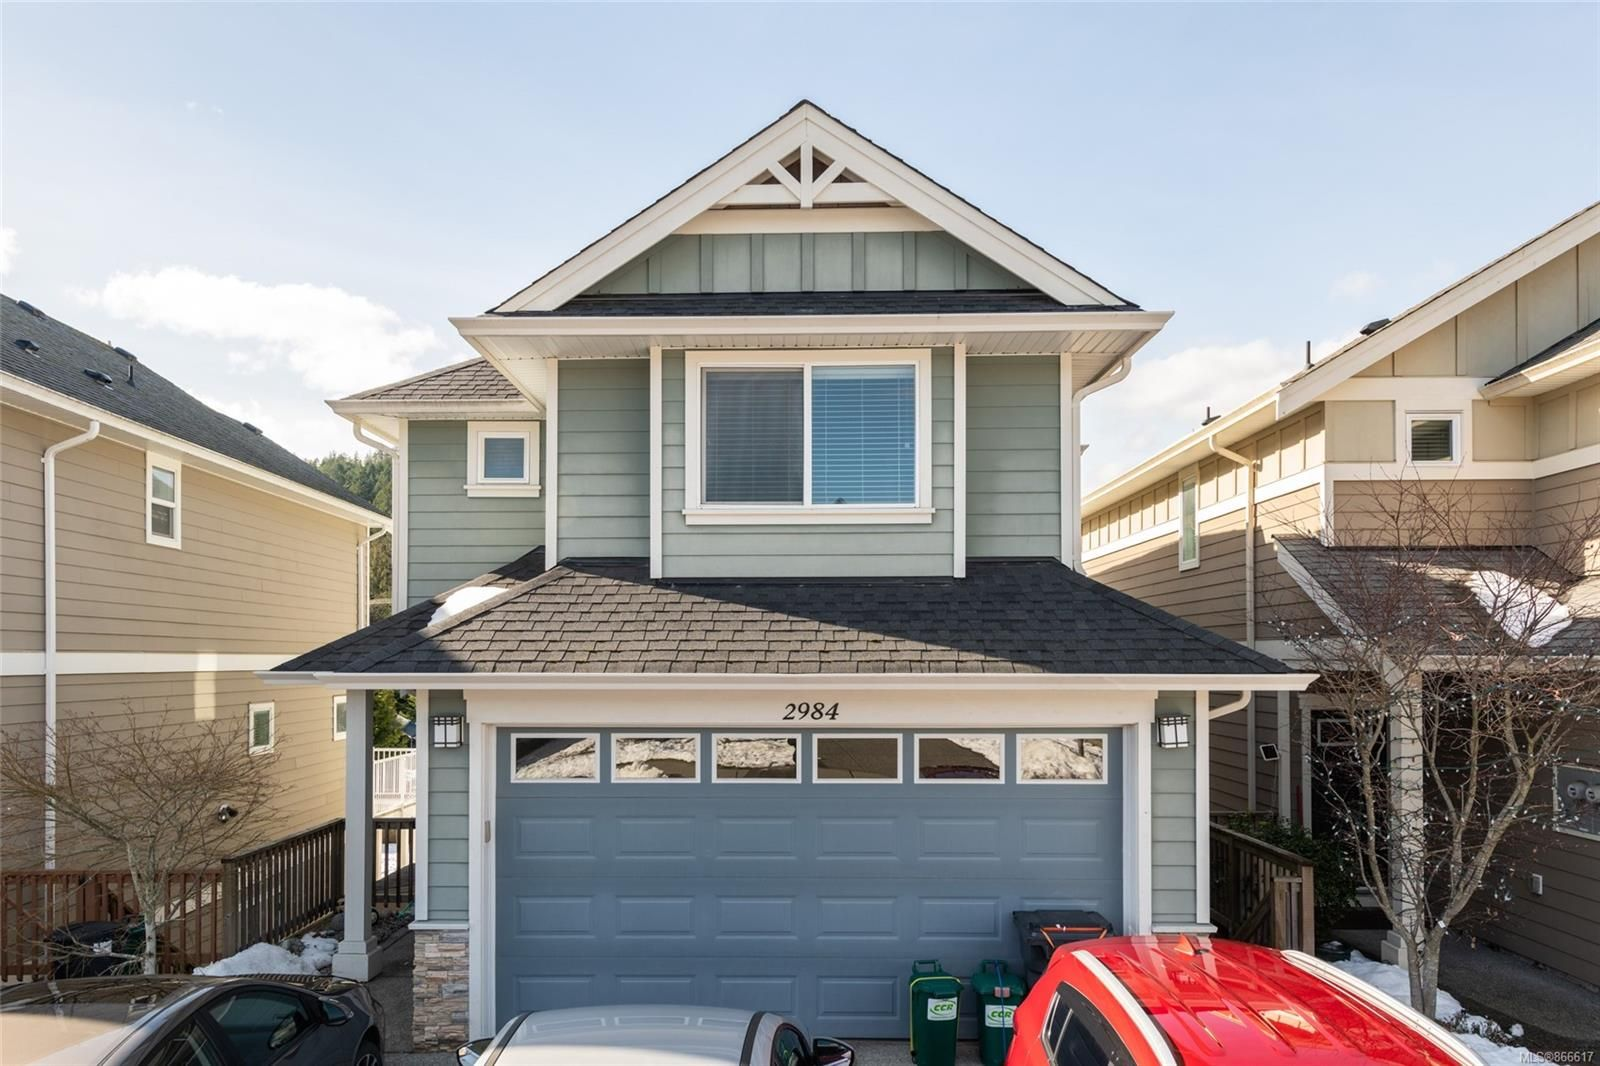 Main Photo: 2984 Dornier Rd in : La Westhills House for sale (Langford)  : MLS®# 866617